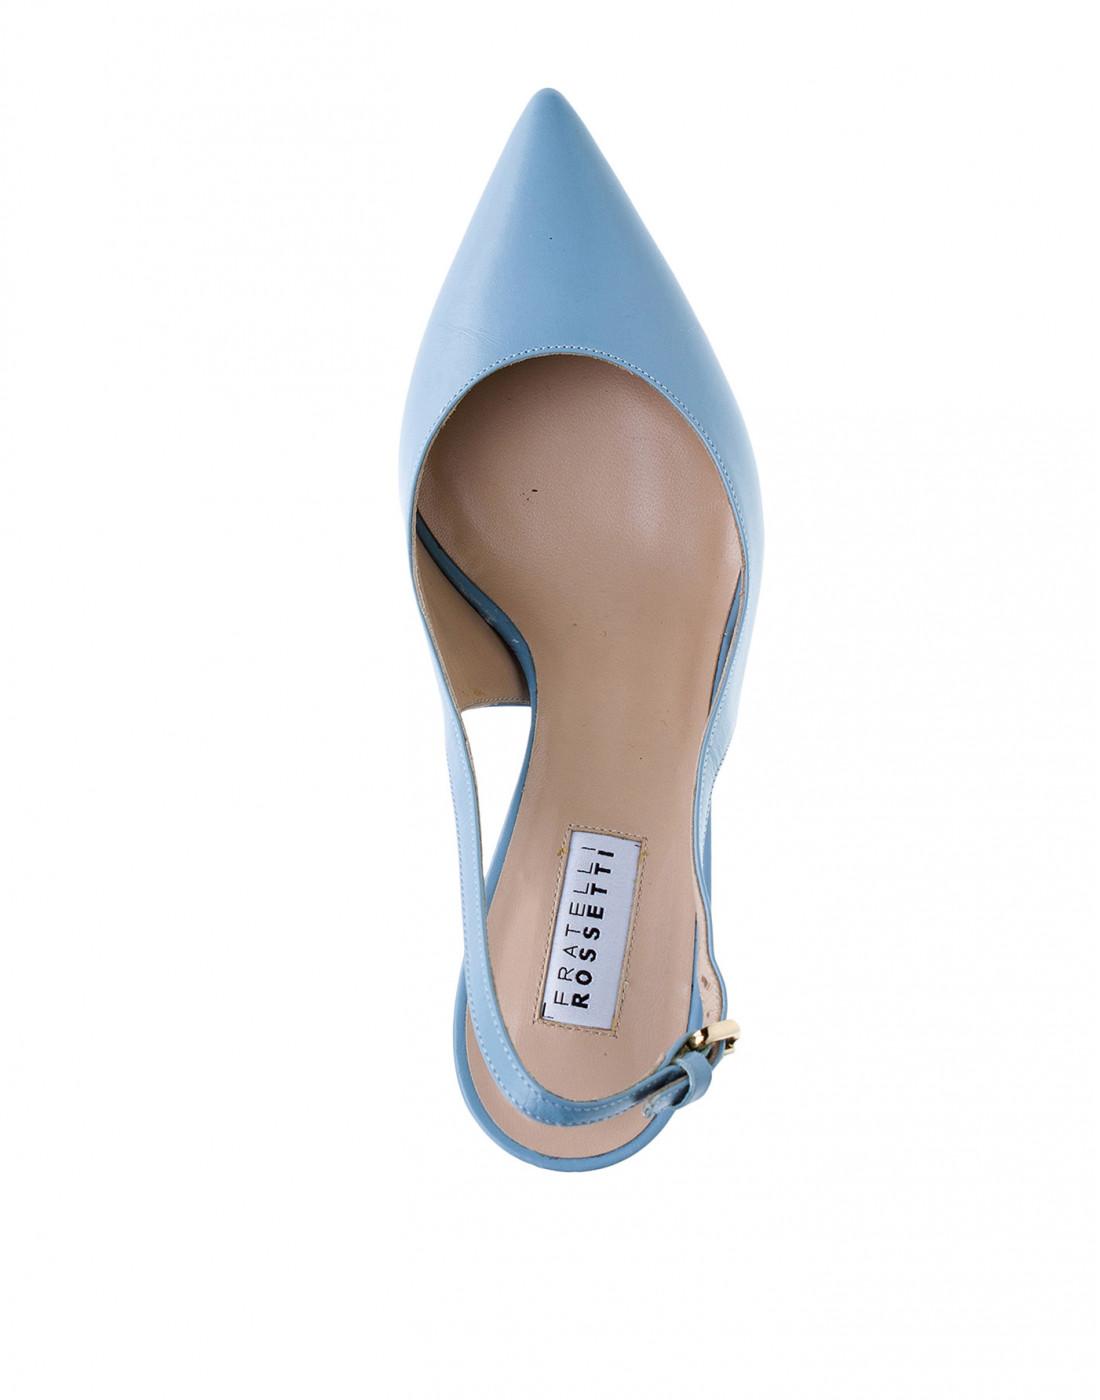 Босоножки голубые женские Fratelli Rossetti S66267-5